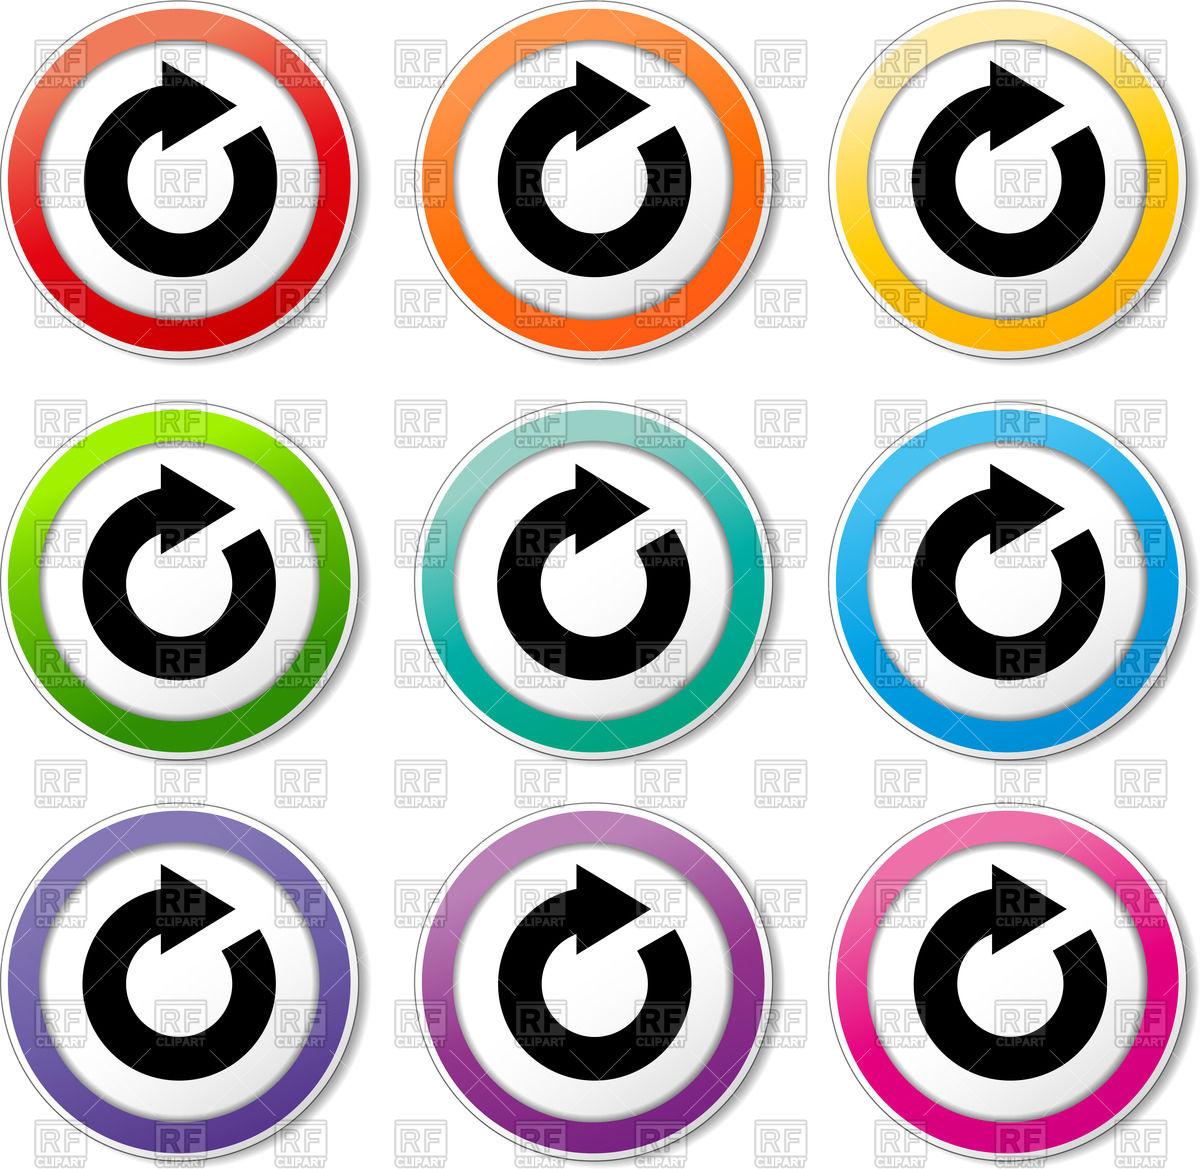 1200x1169 Refresh Icon Vector Image Vector Artwork Of Signs, Symbols, Maps